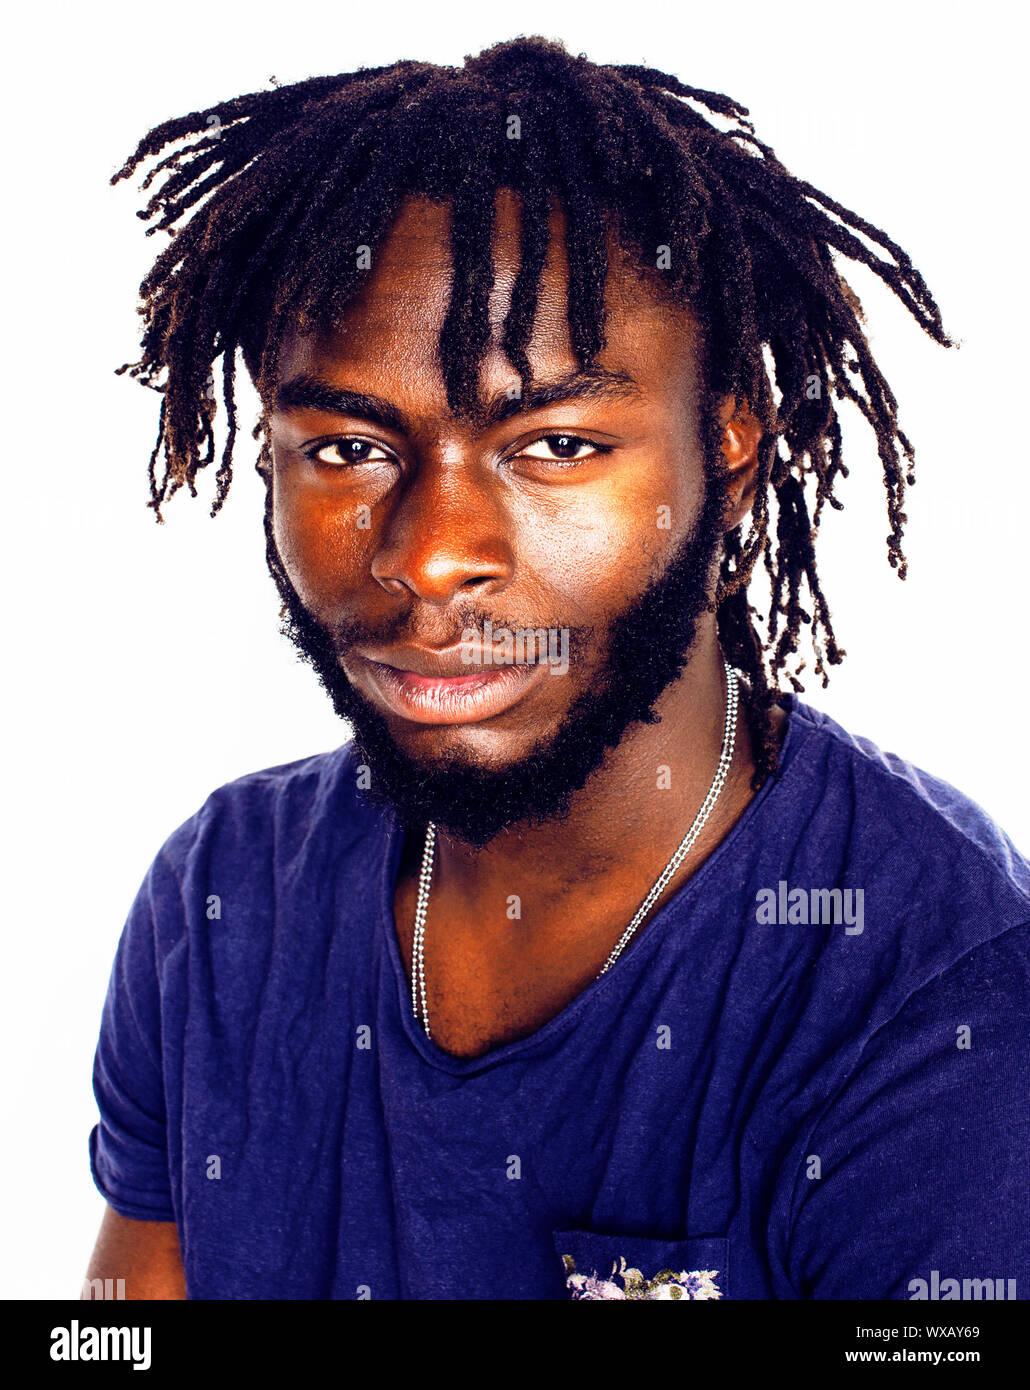 Giovane bello afro american boy elegante hipster emotivo gesti isolati su sfondo bianco sorridente Foto Stock